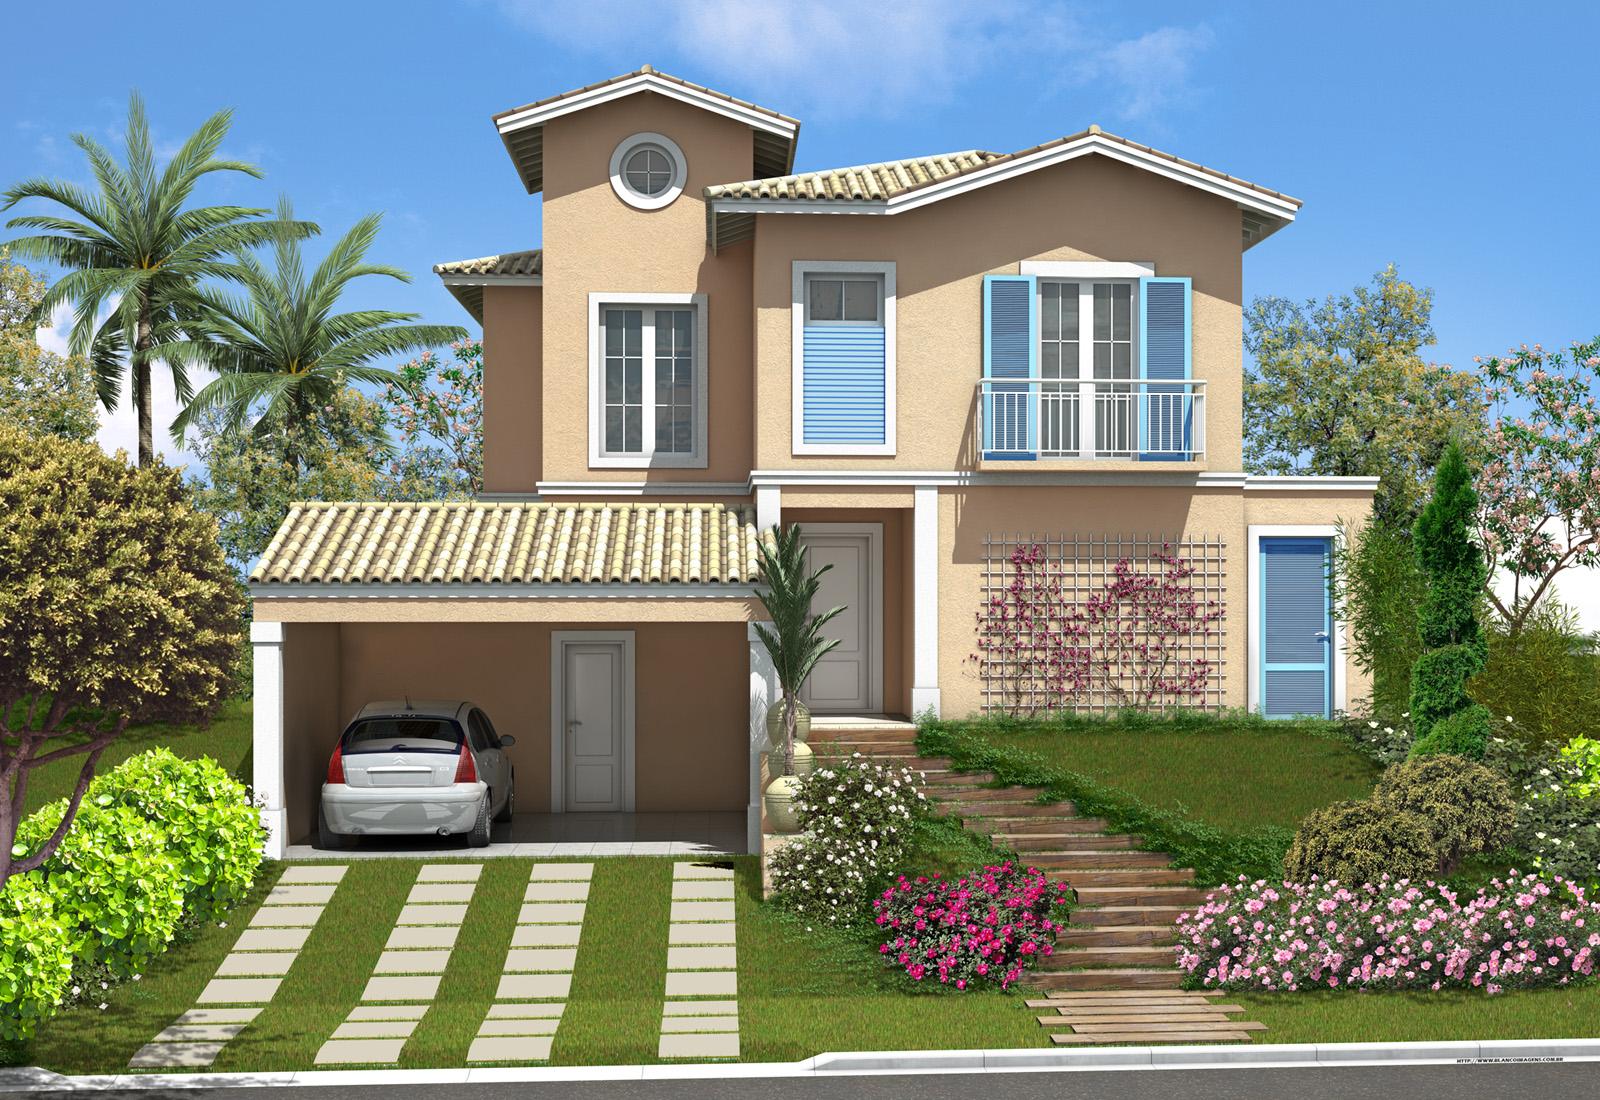 Modelos de casas muito bonitas dicas na web - Modulos de casas ...